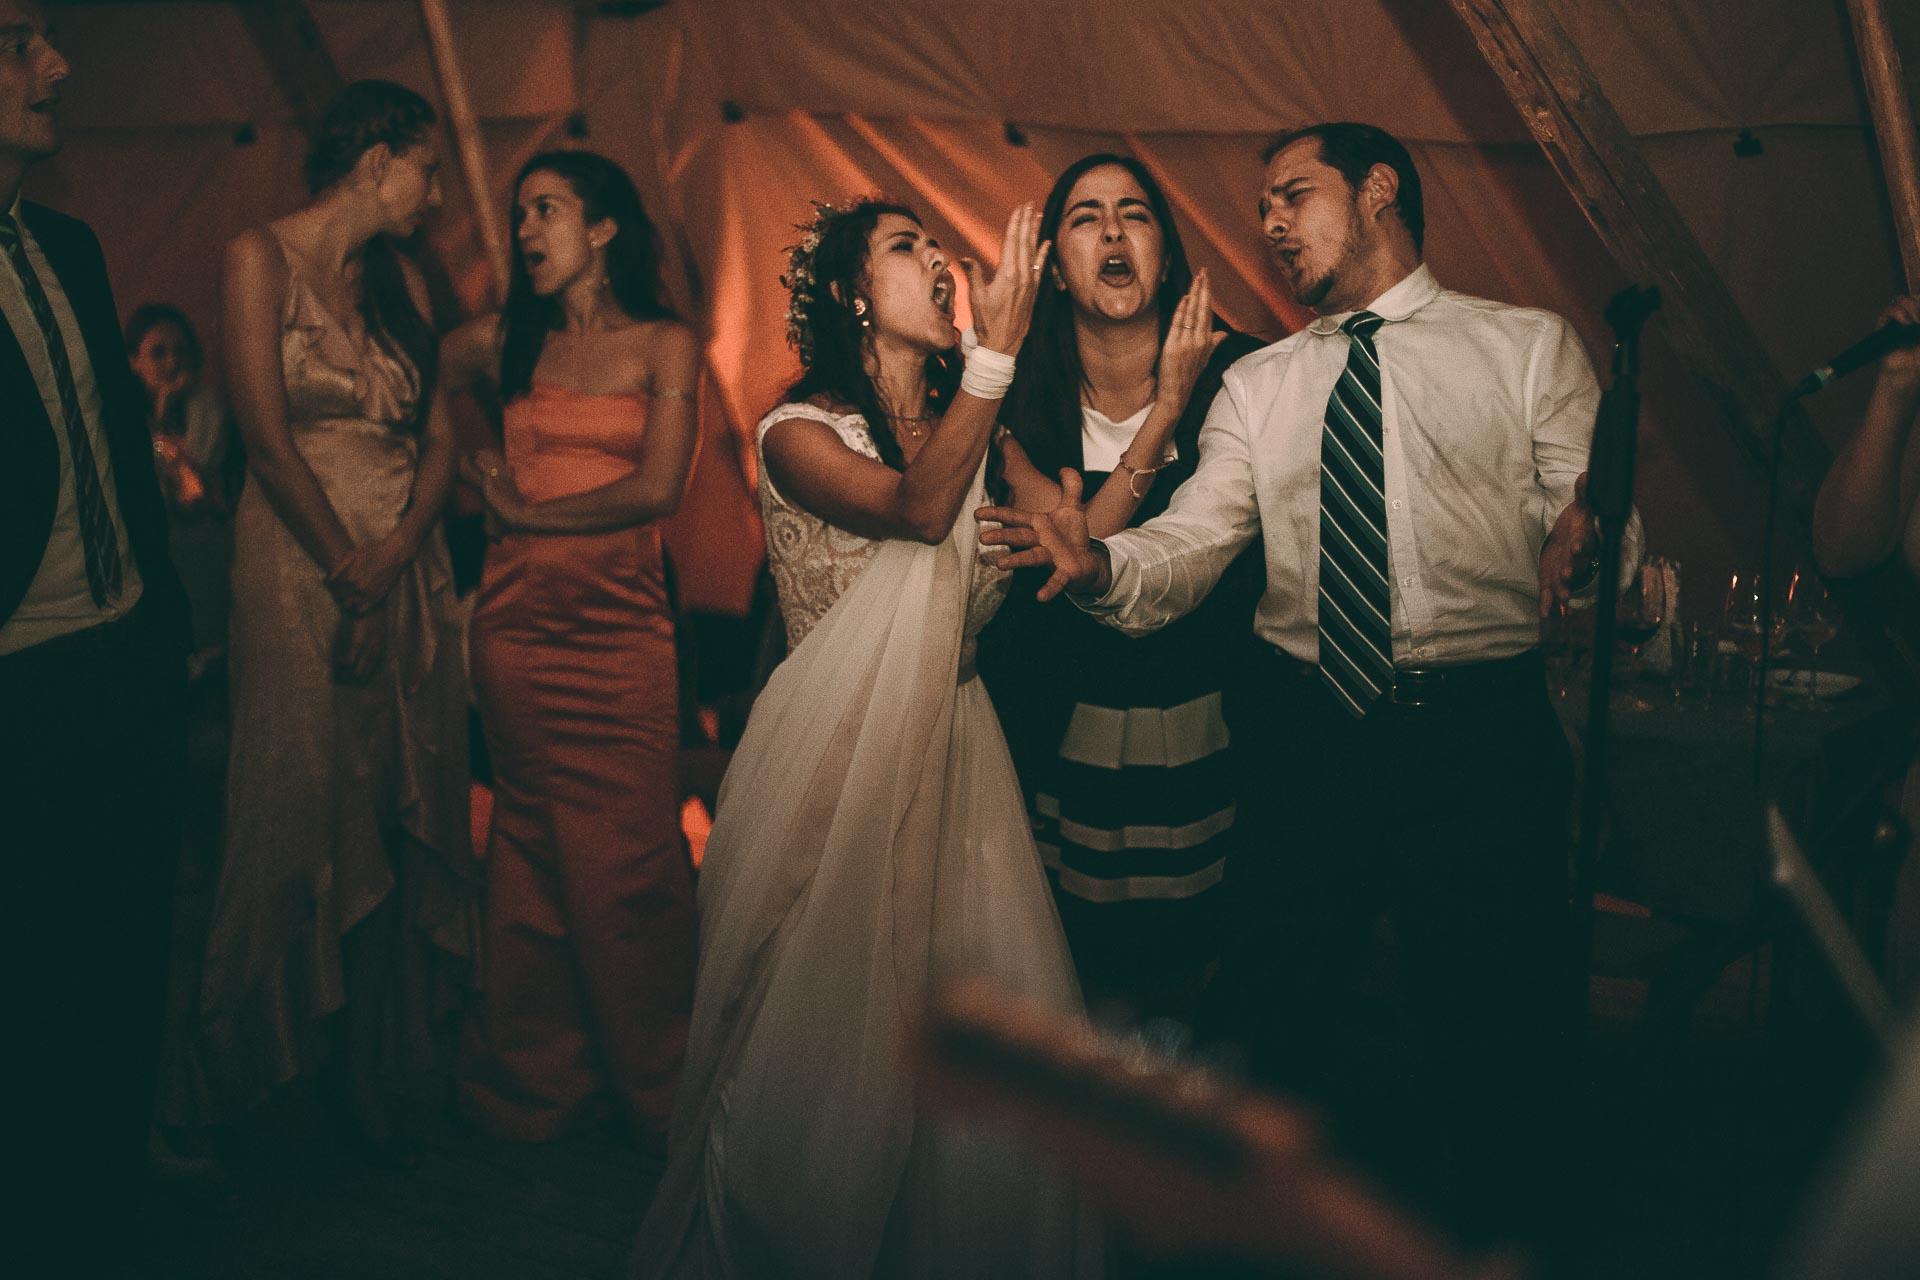 Hochzeits Party im Boho VIntage Style im Blueland